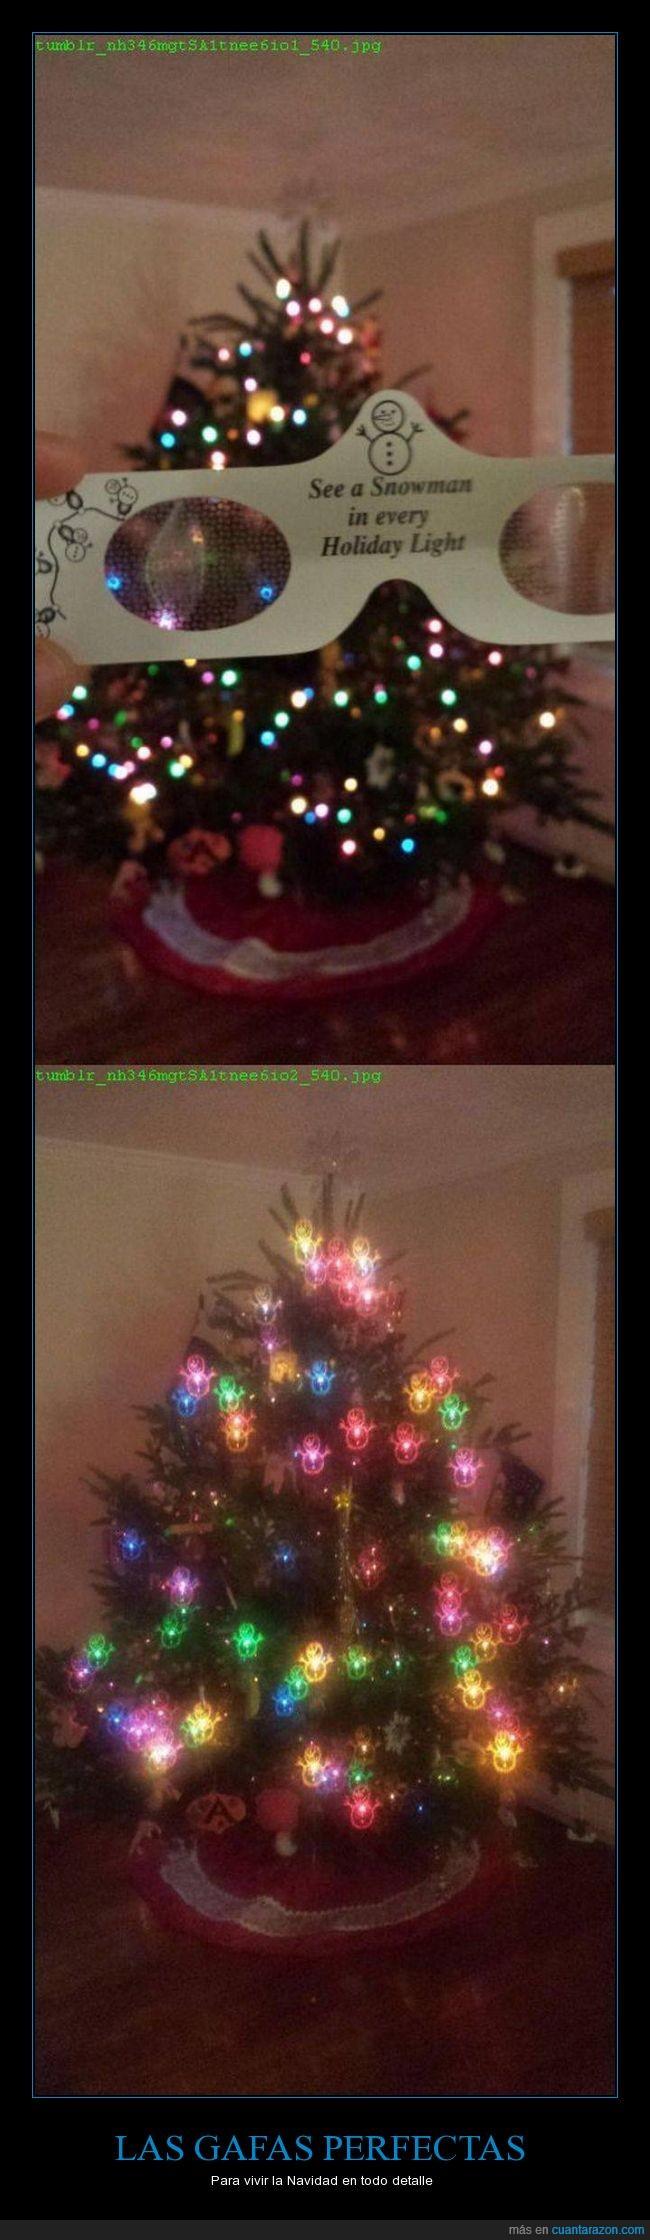 filtro,gafas,led,luz,muñeco,nieve,snowman